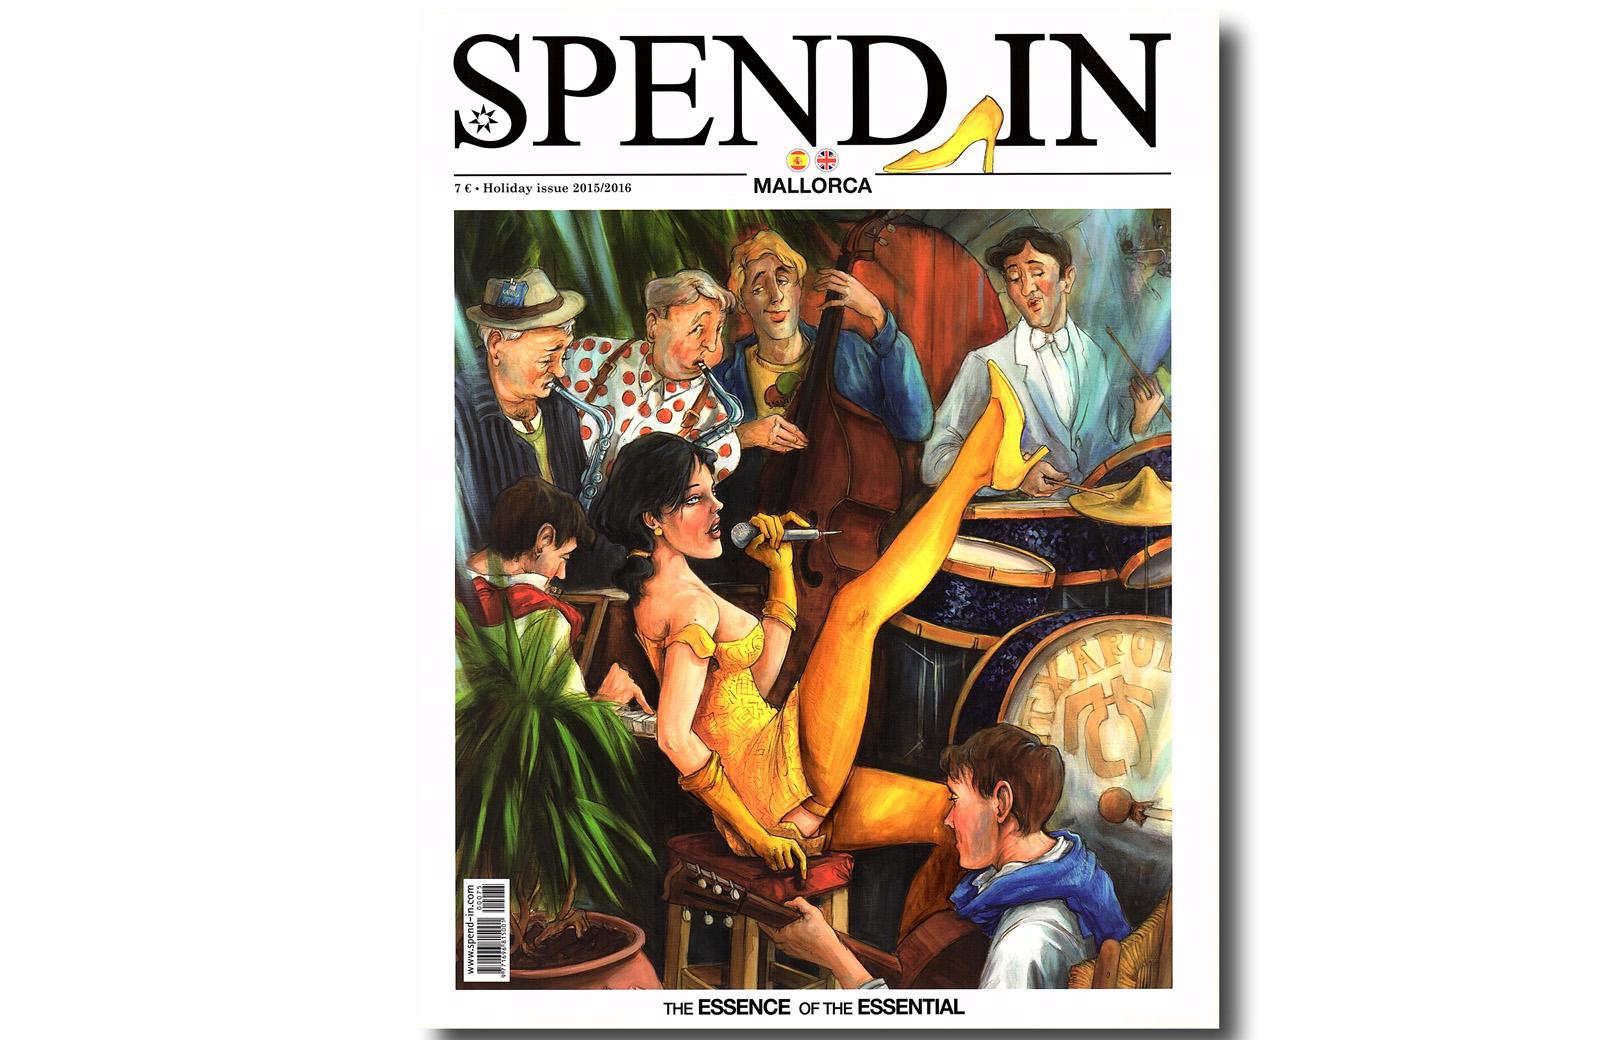 spend-in_00_portada